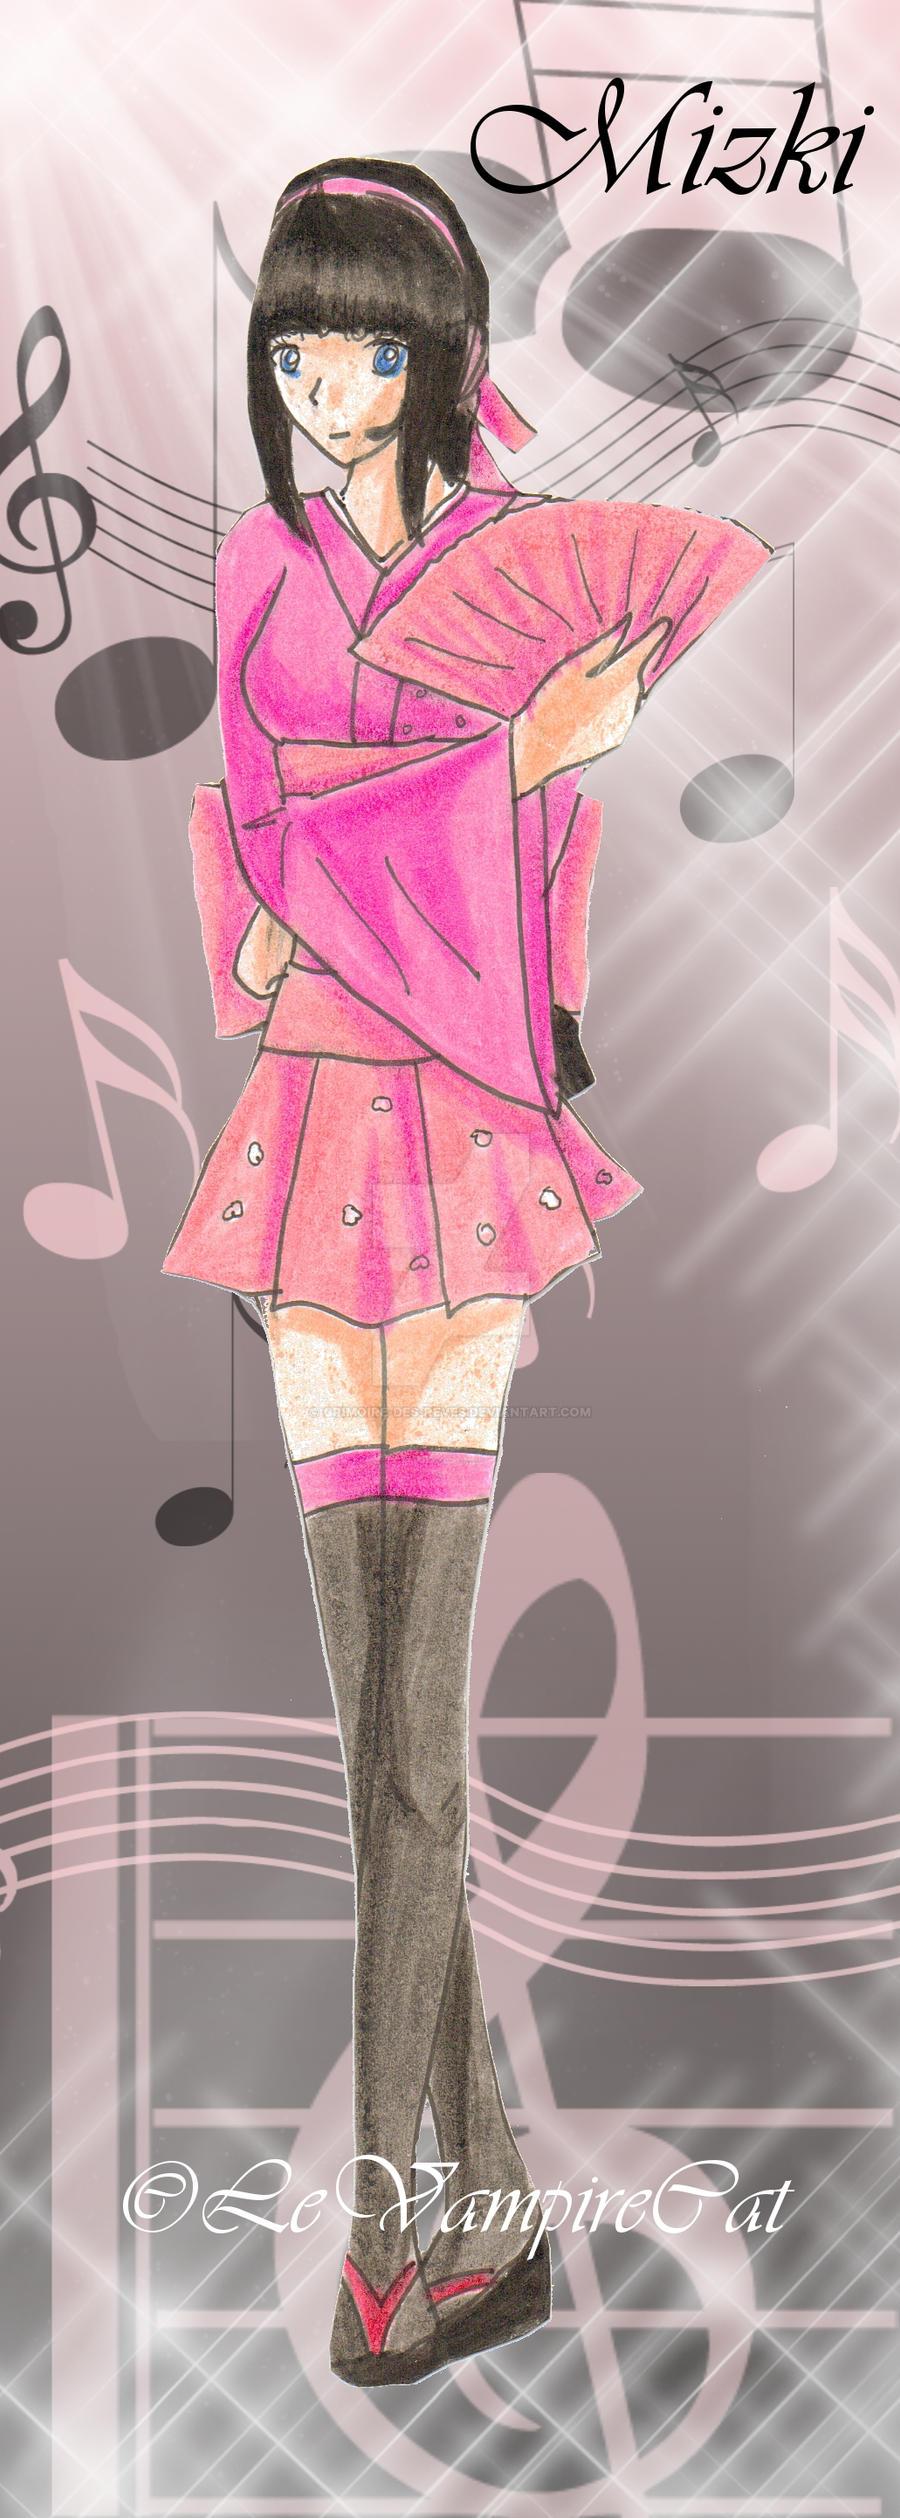 Vocaloid Mizki by Grimoire-Des-Reves